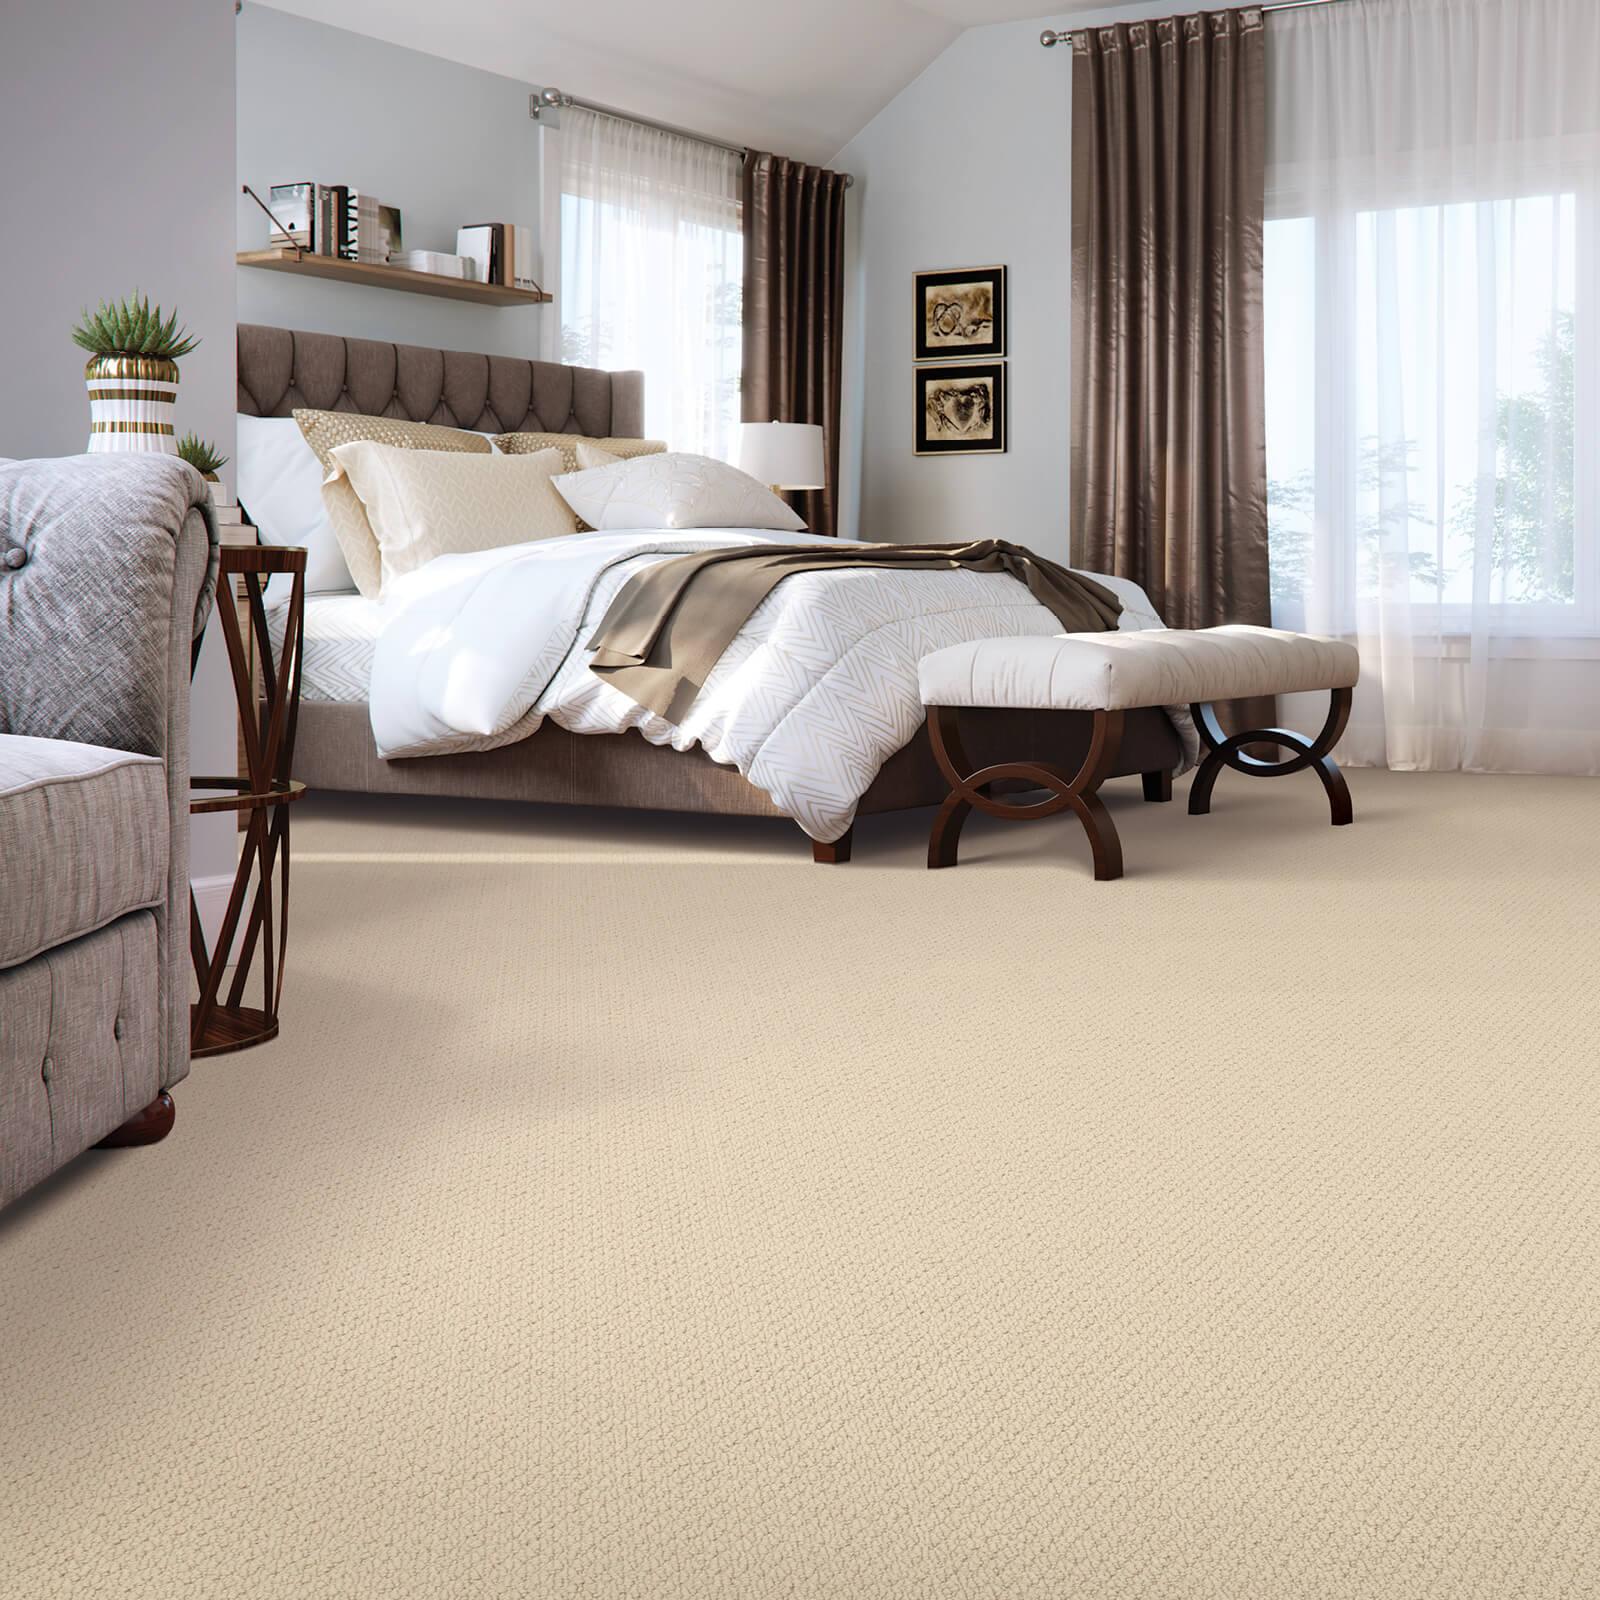 New carpet in bedroom | Great Floors